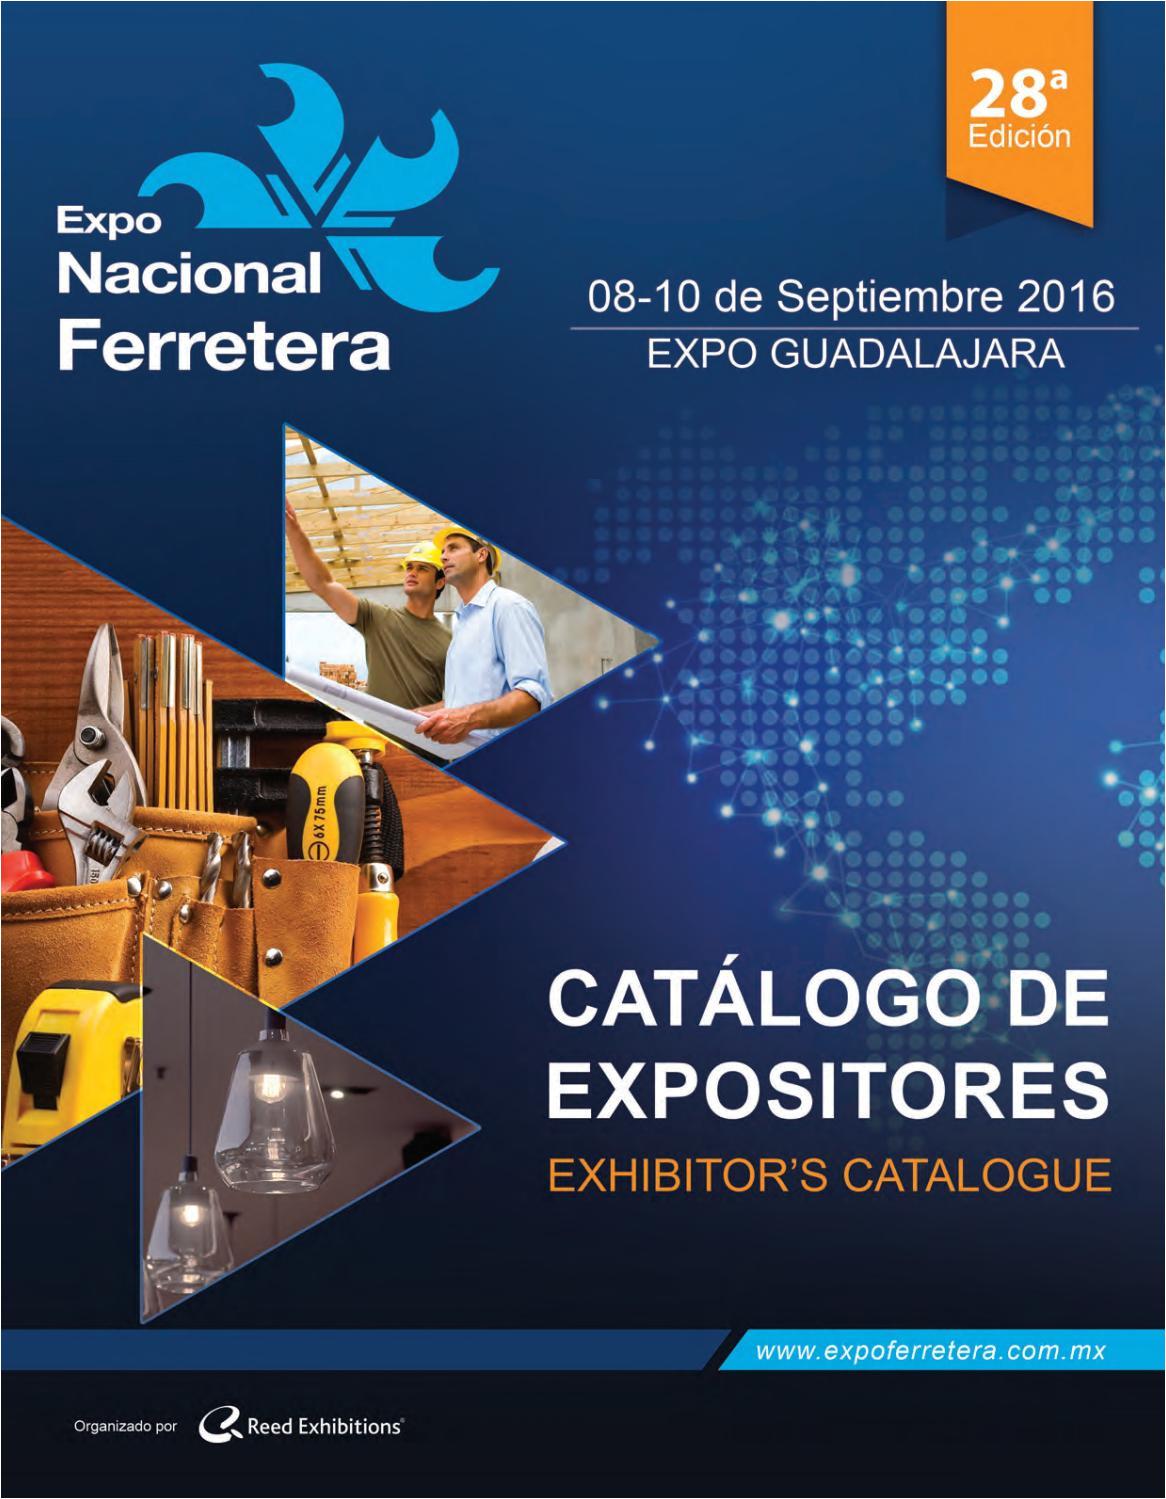 expo nacional ferretera catalogo de expositores 2016 by reed exhibitions mexico issuu